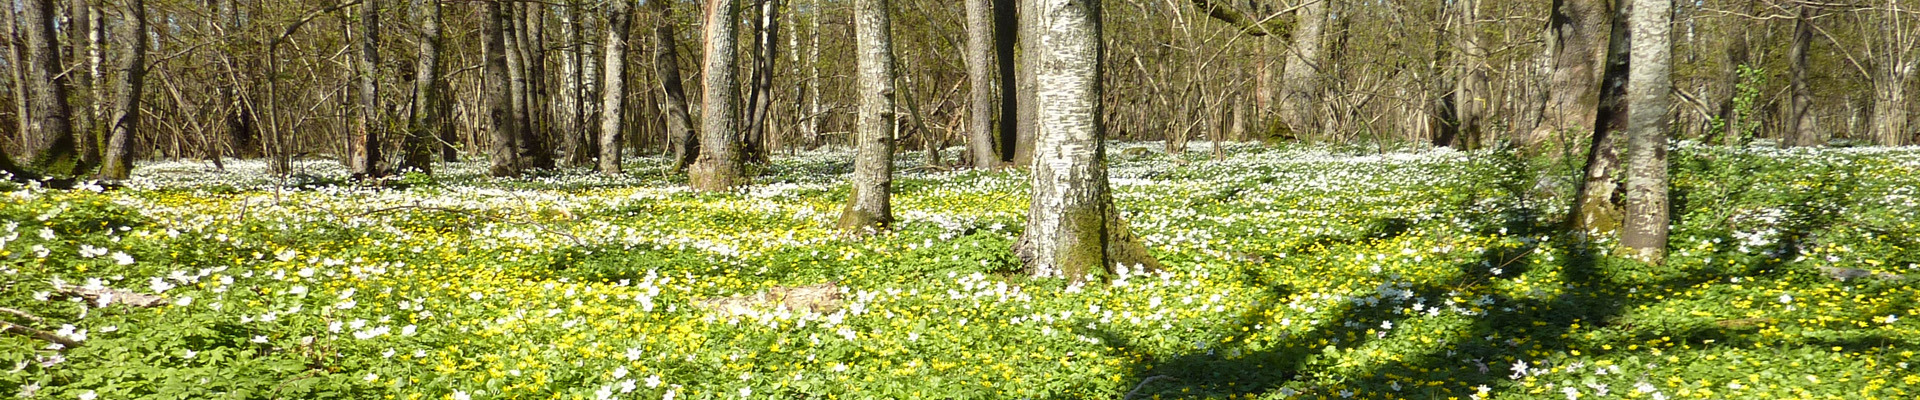 skogbunn.jpg